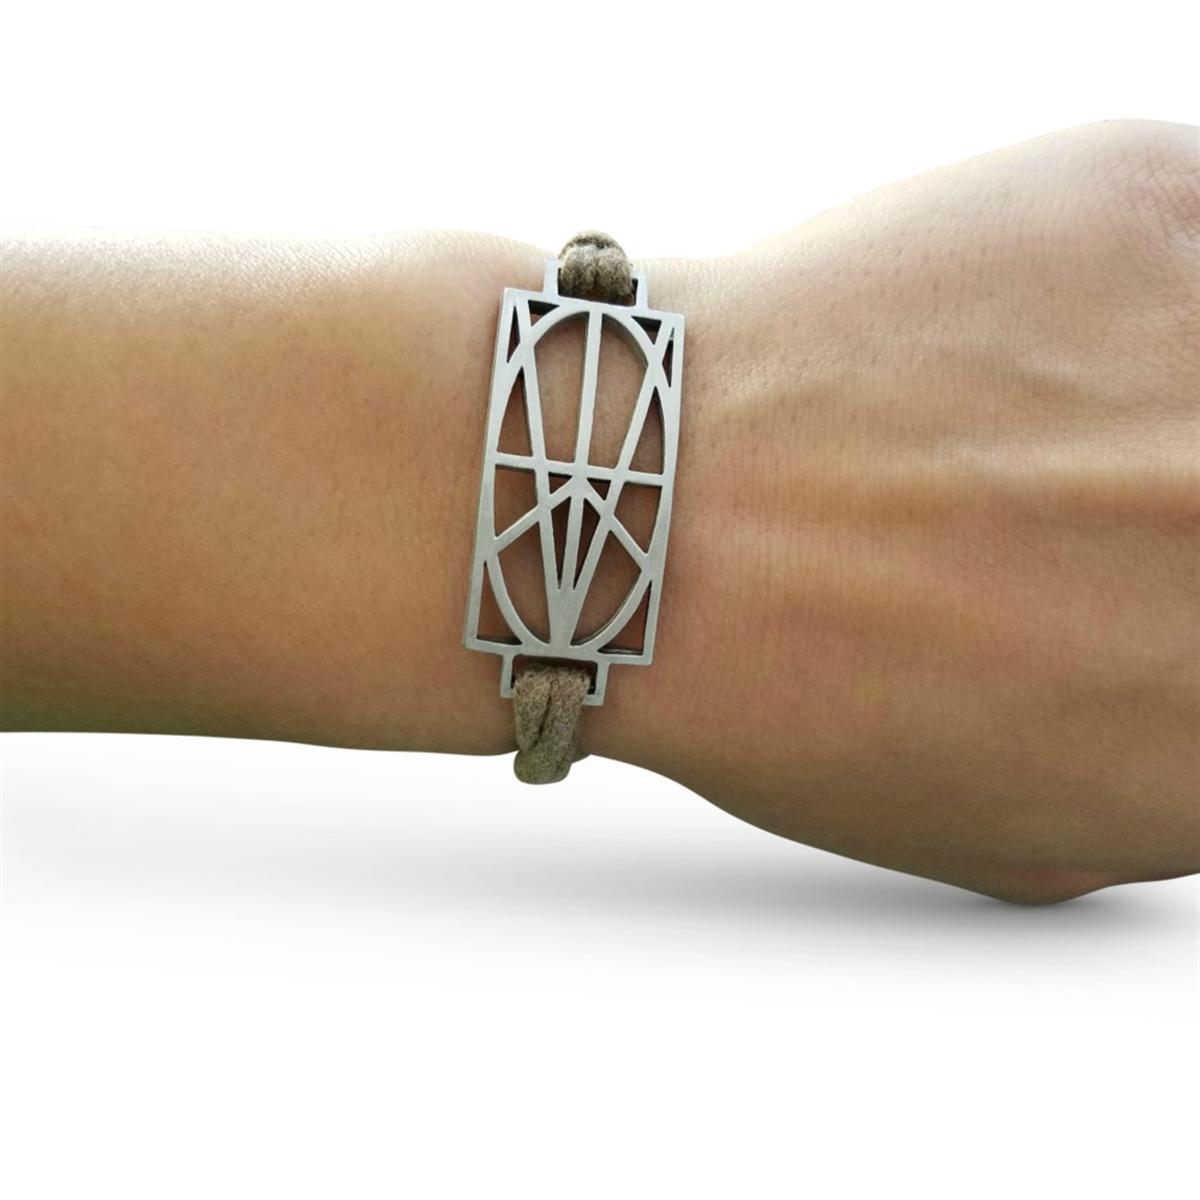 Picture of Women's Tan Wrap & Tuck Bracelet - Large Zymbol